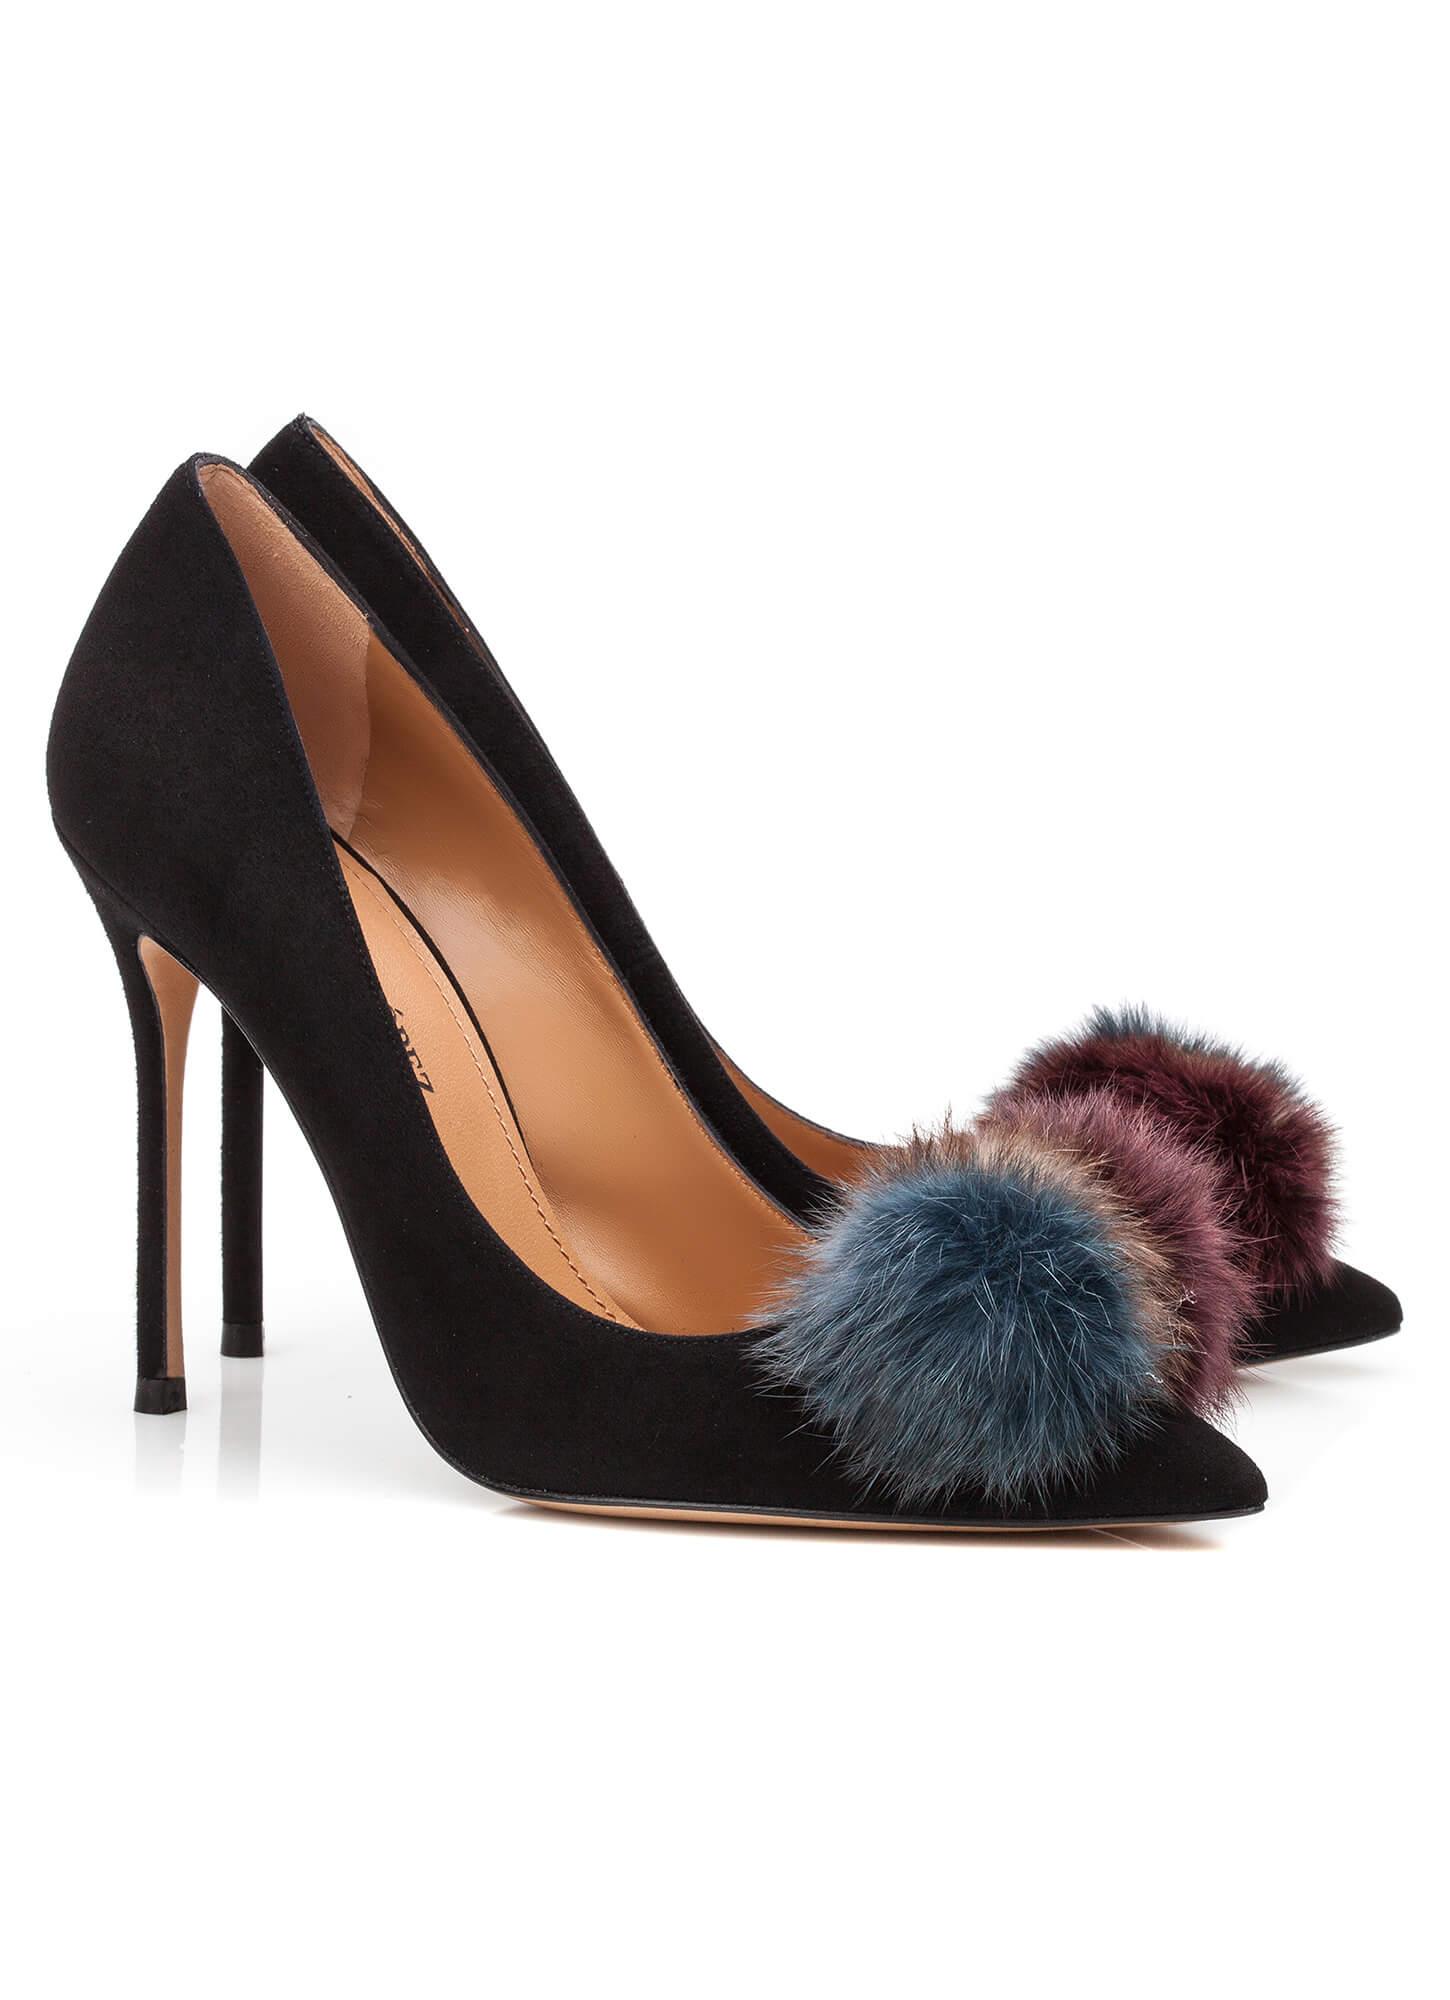 c4b8336bb Pompom-embellished high heel pumps in black suede Black pompom-embellished  heeled pump - online shoe store Pura Lopez ...